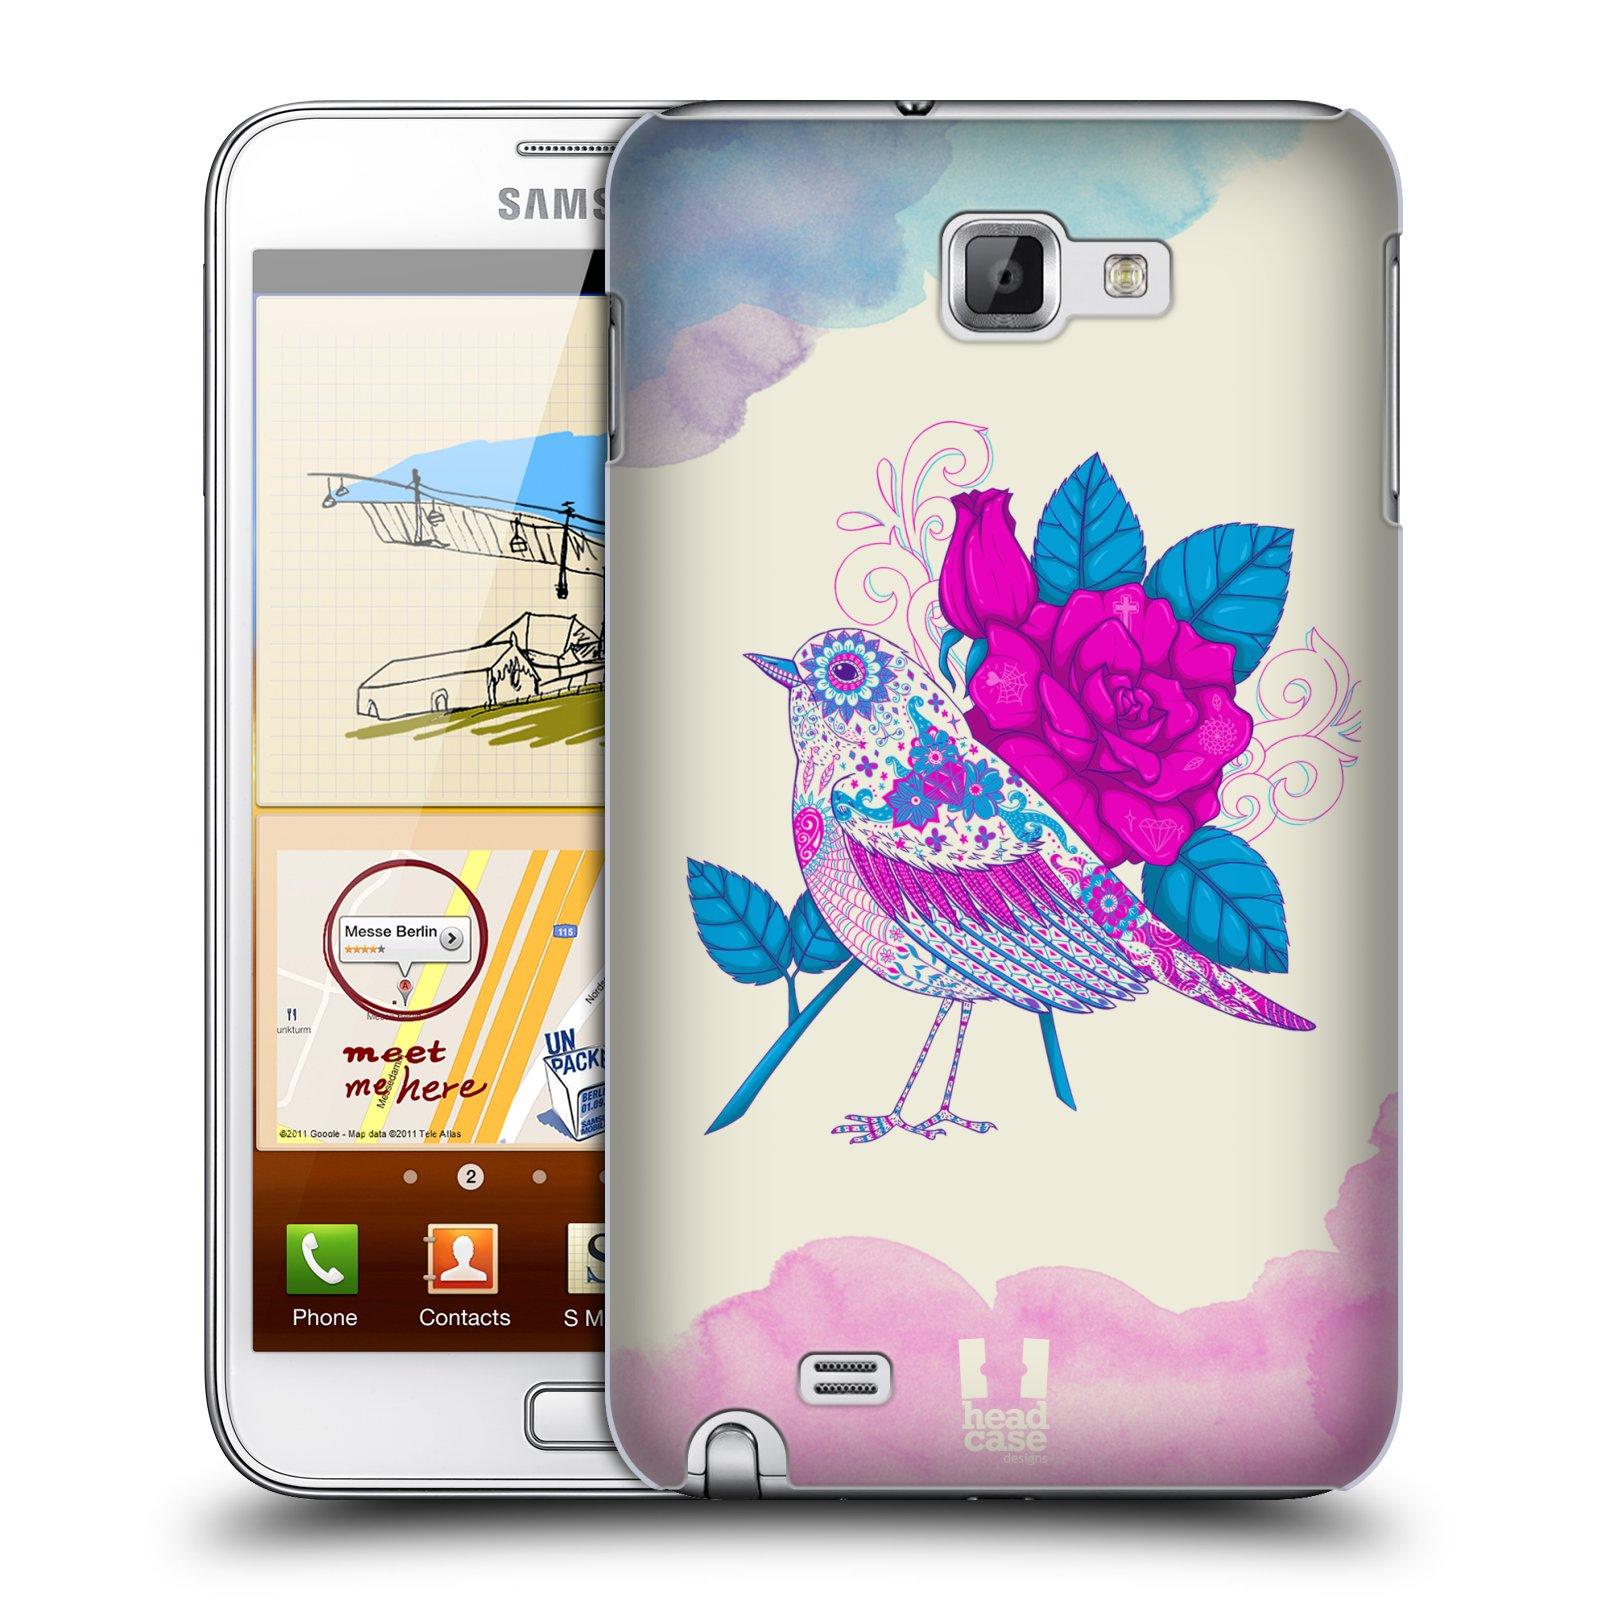 HEAD CASE plastový obal na mobil SAMSUNG Galaxy Note N7000 (i9220) vzor Květina ptáčci FIALOVÁ